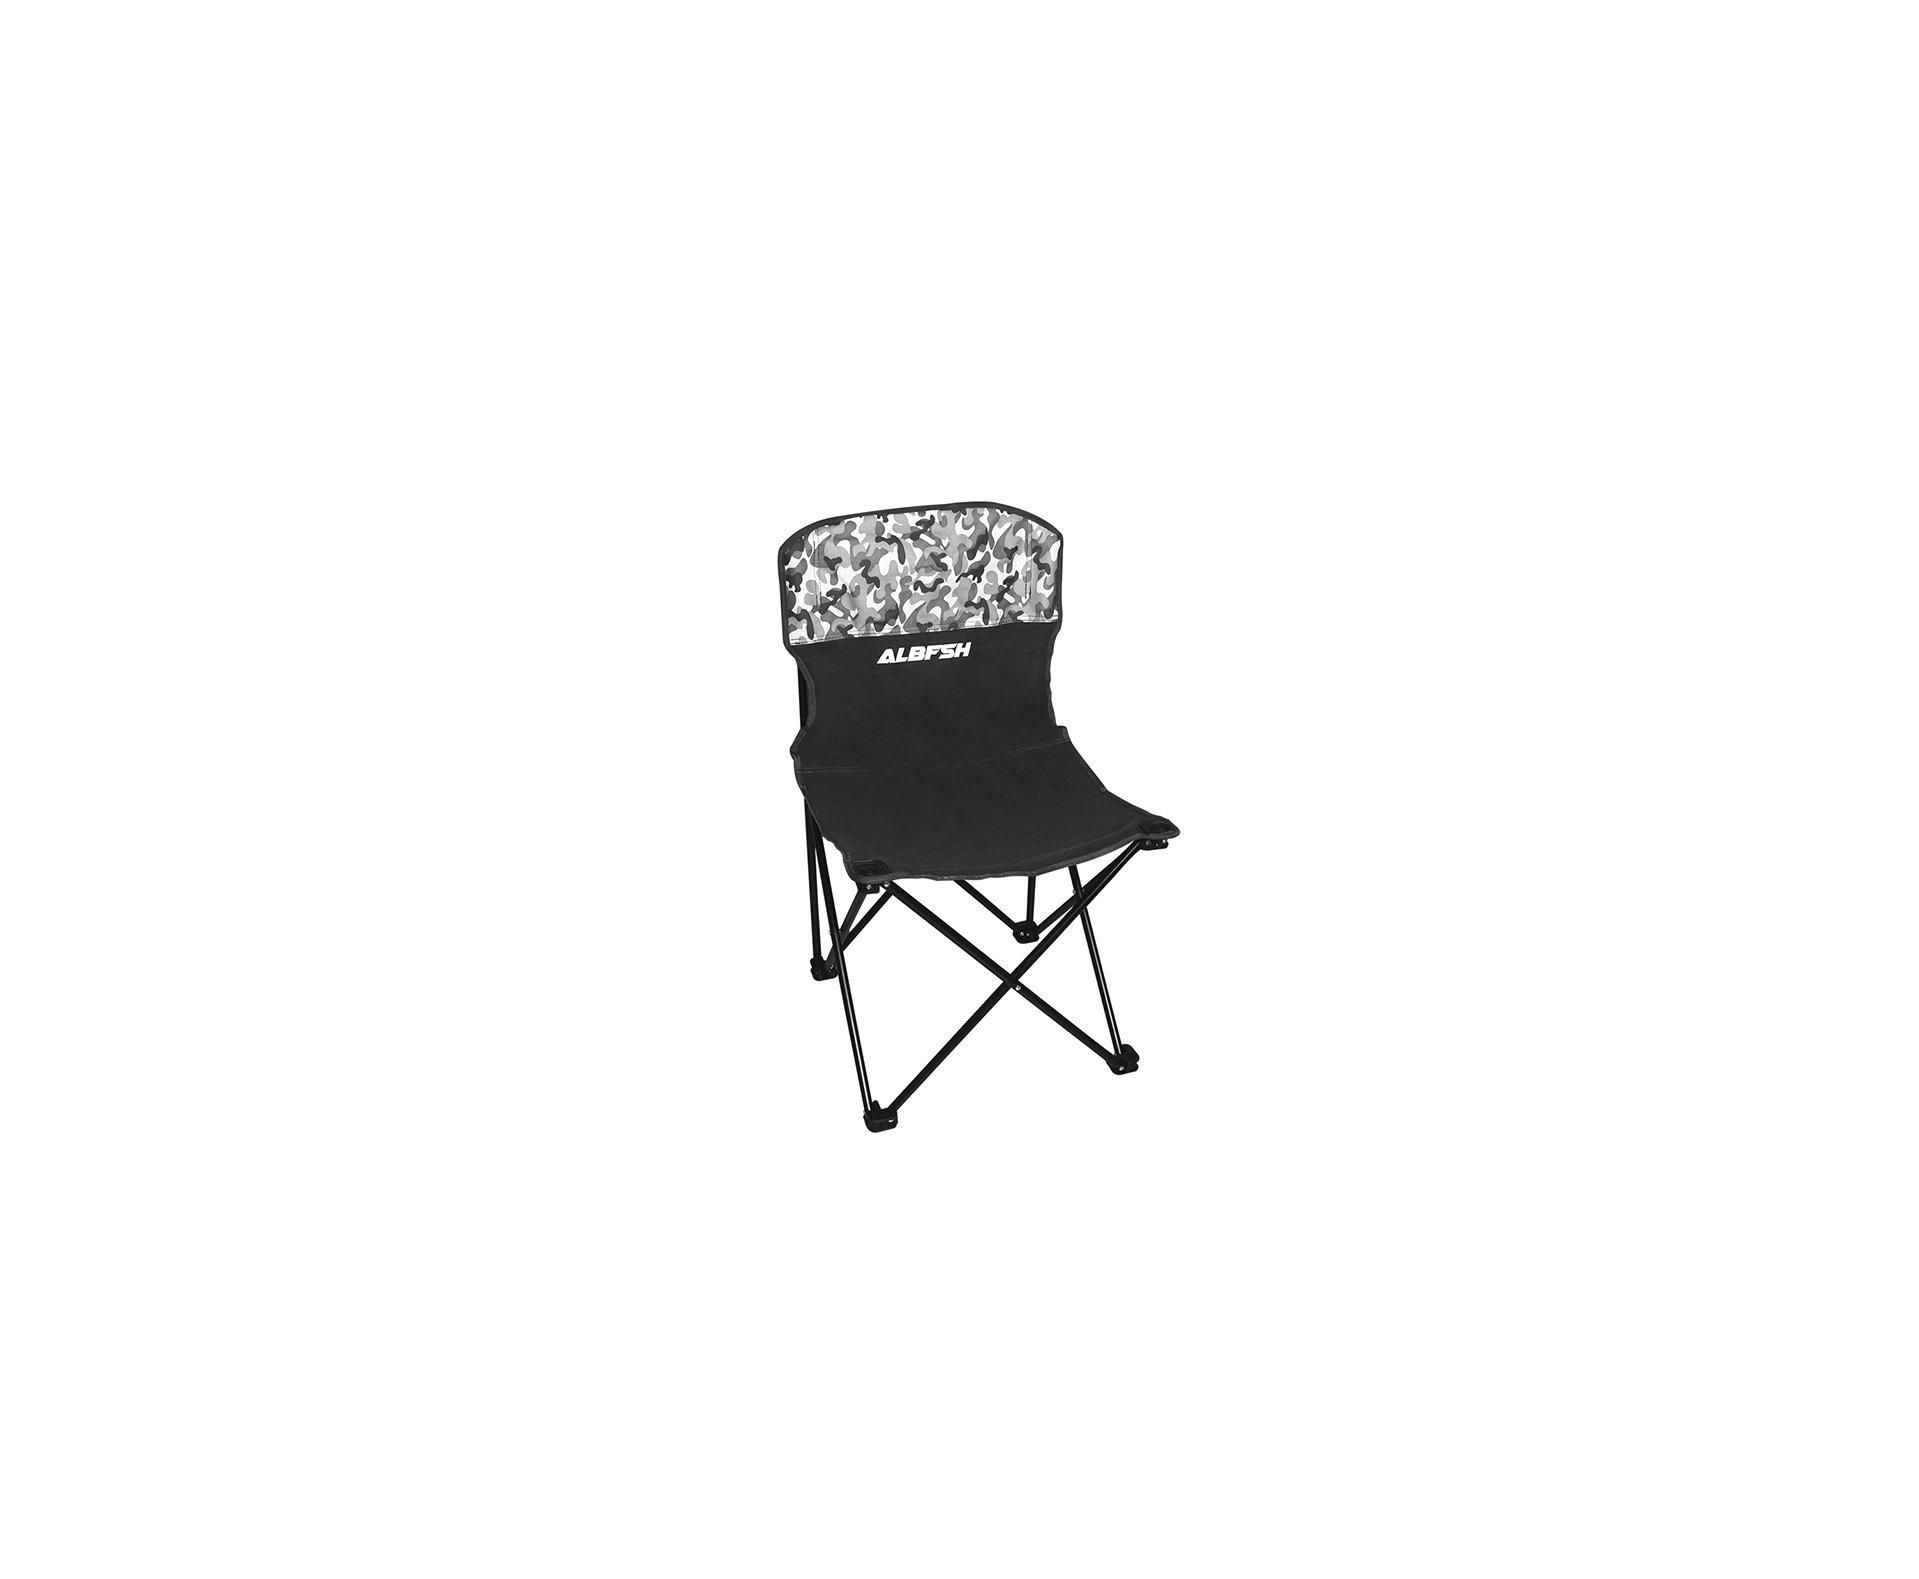 Cadeira Camping Albatroz Hb-a12mh